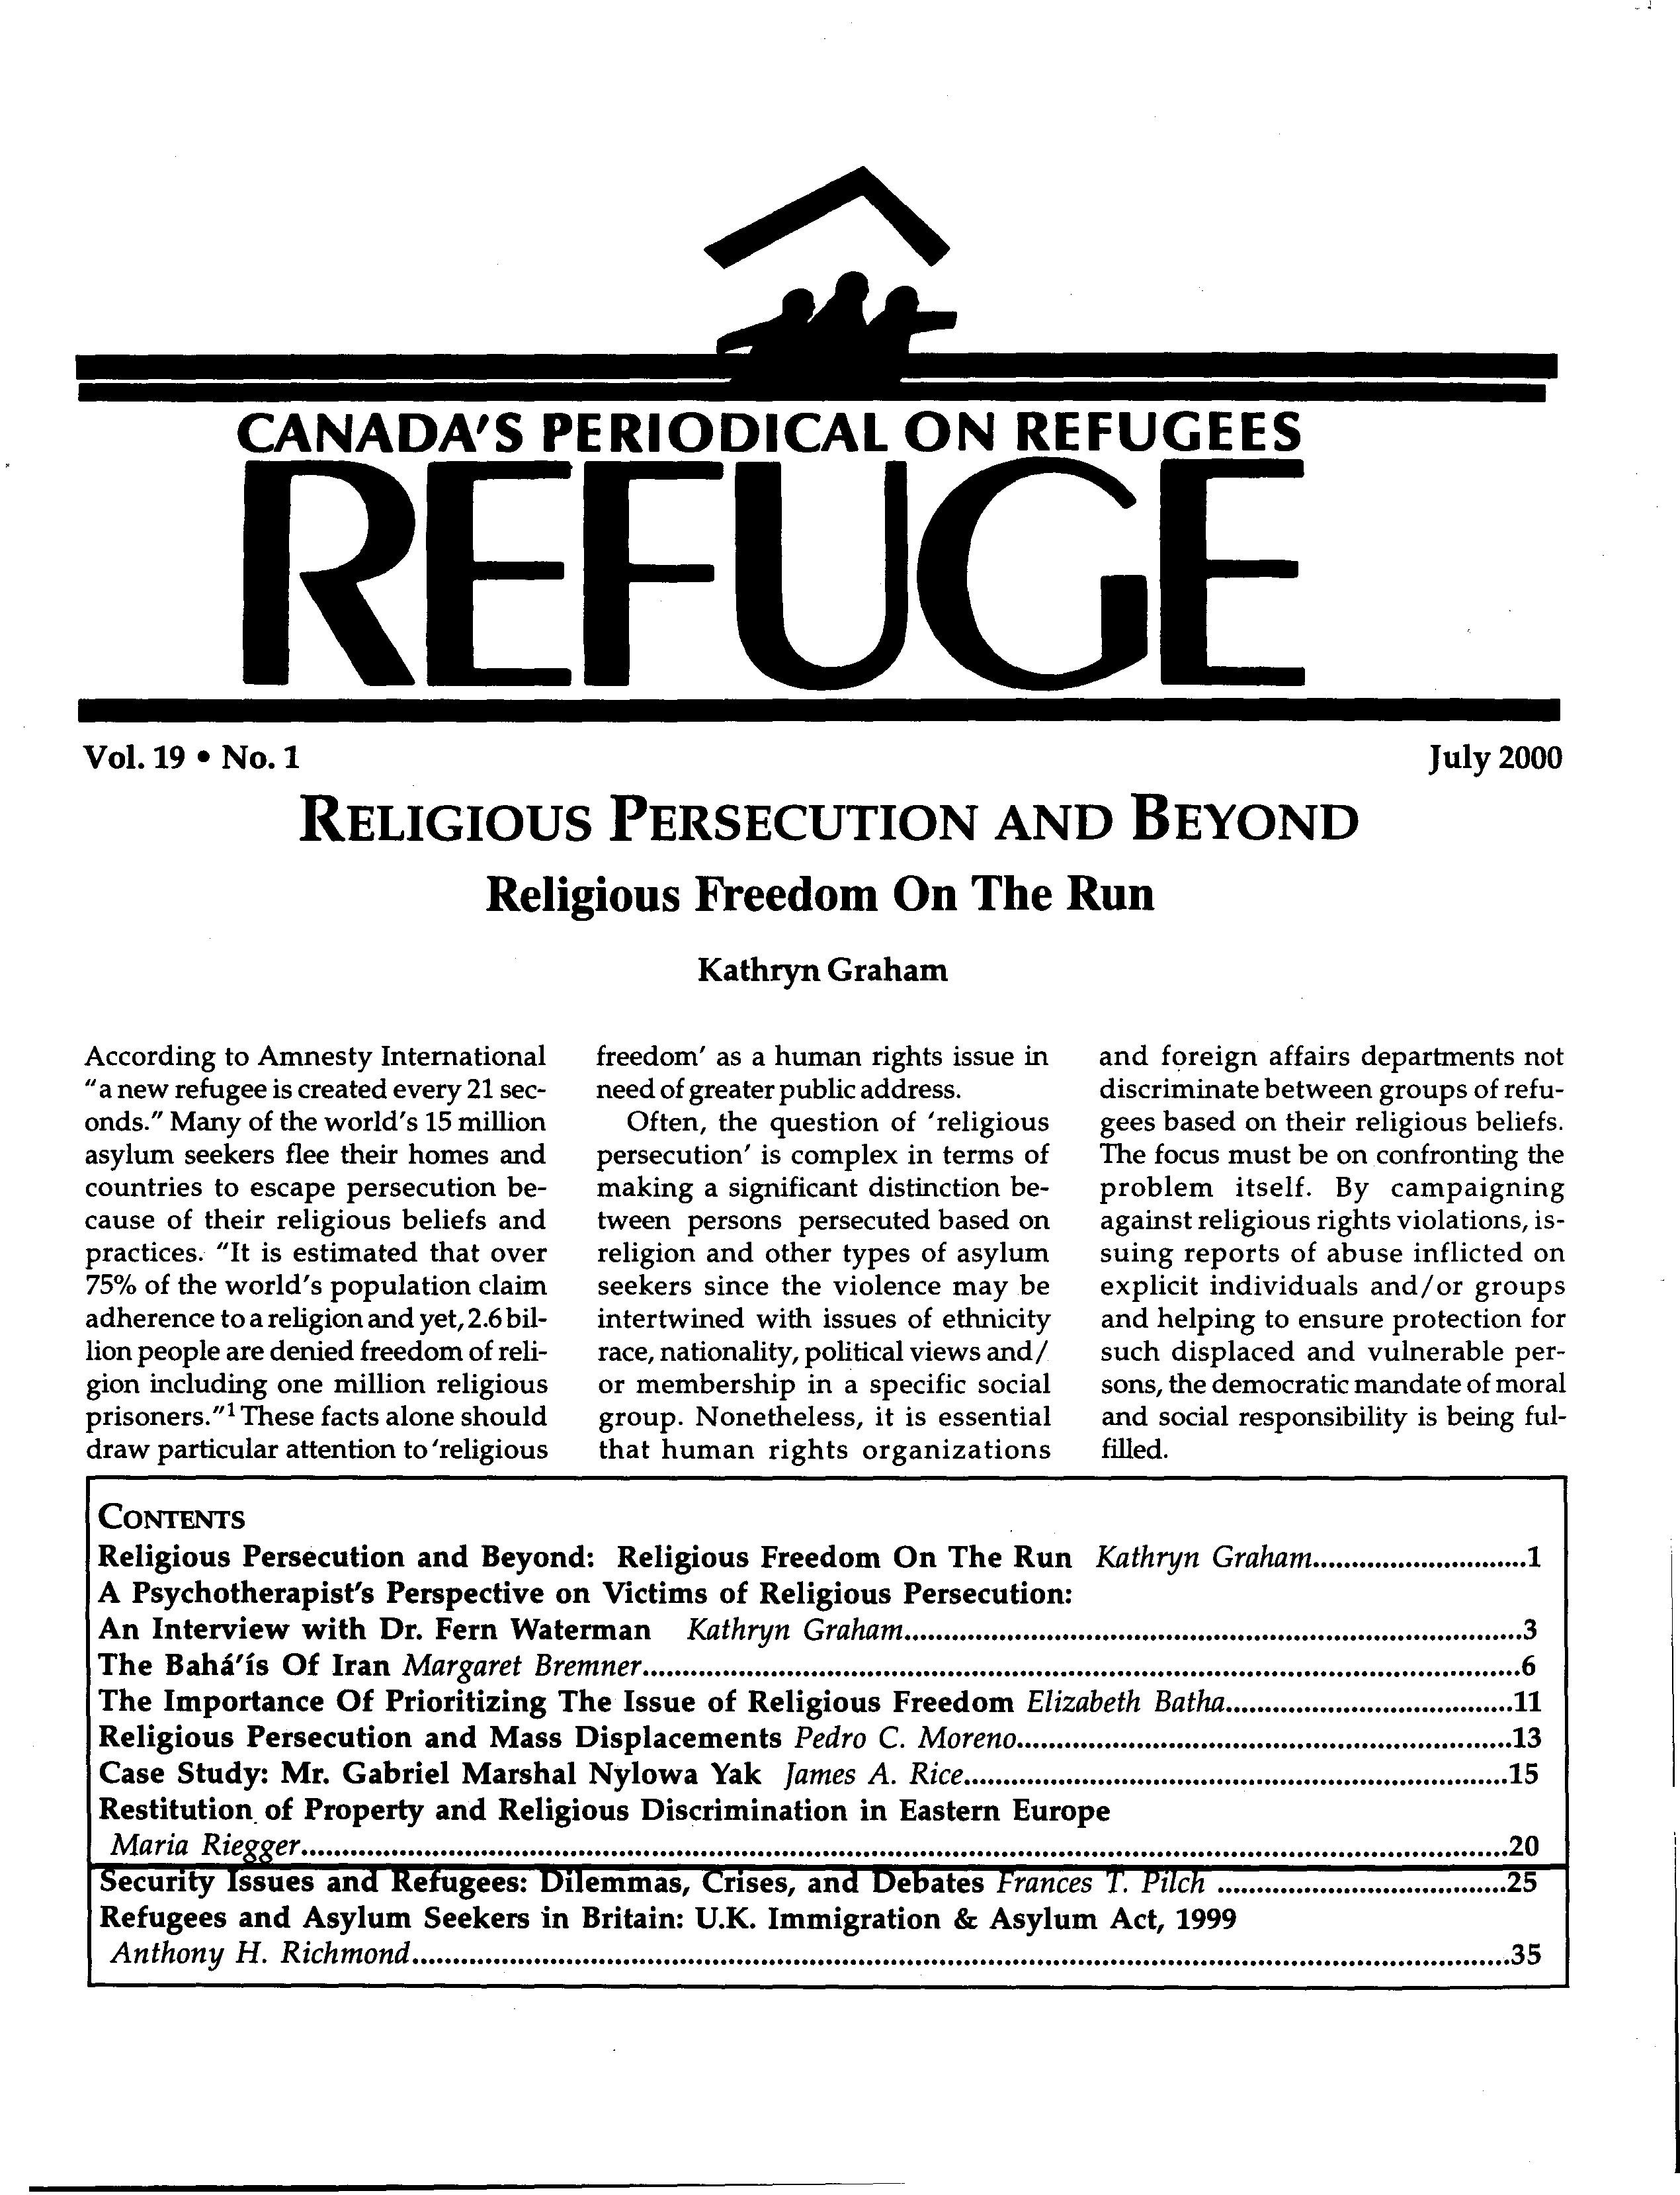 first page Refuge vol. 19.1 2000